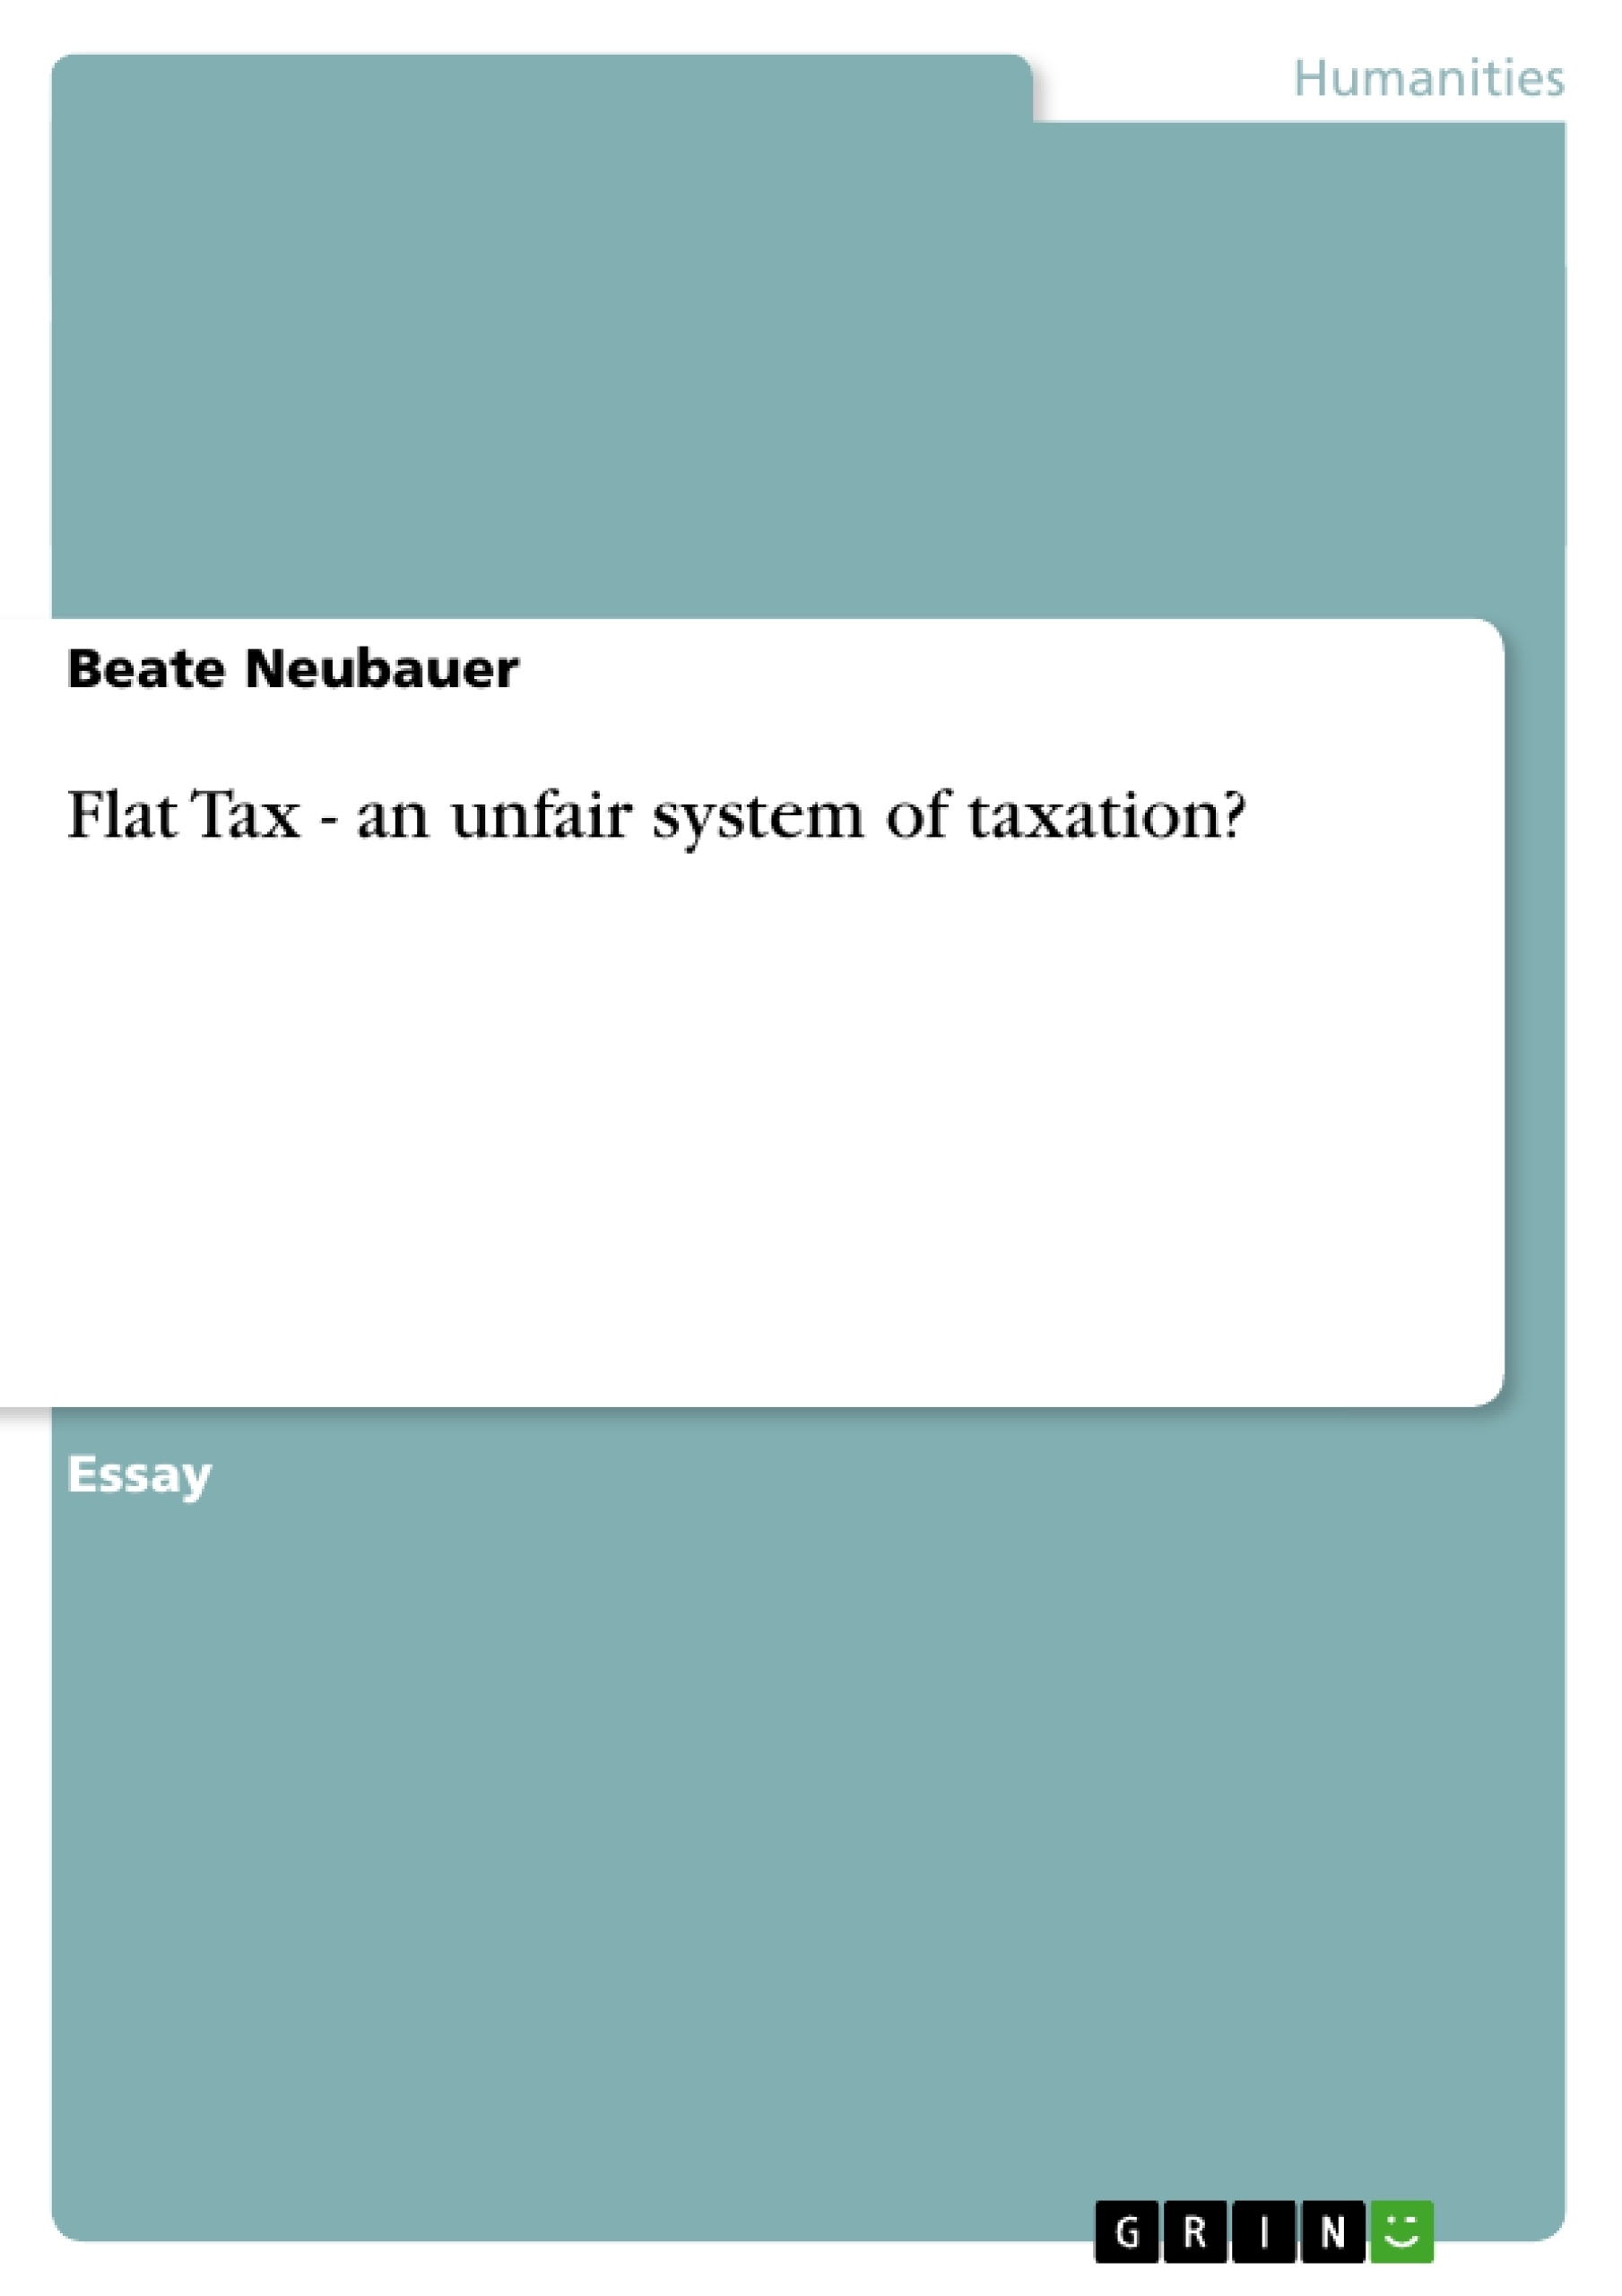 Title: Flat Tax - an unfair system of taxation?